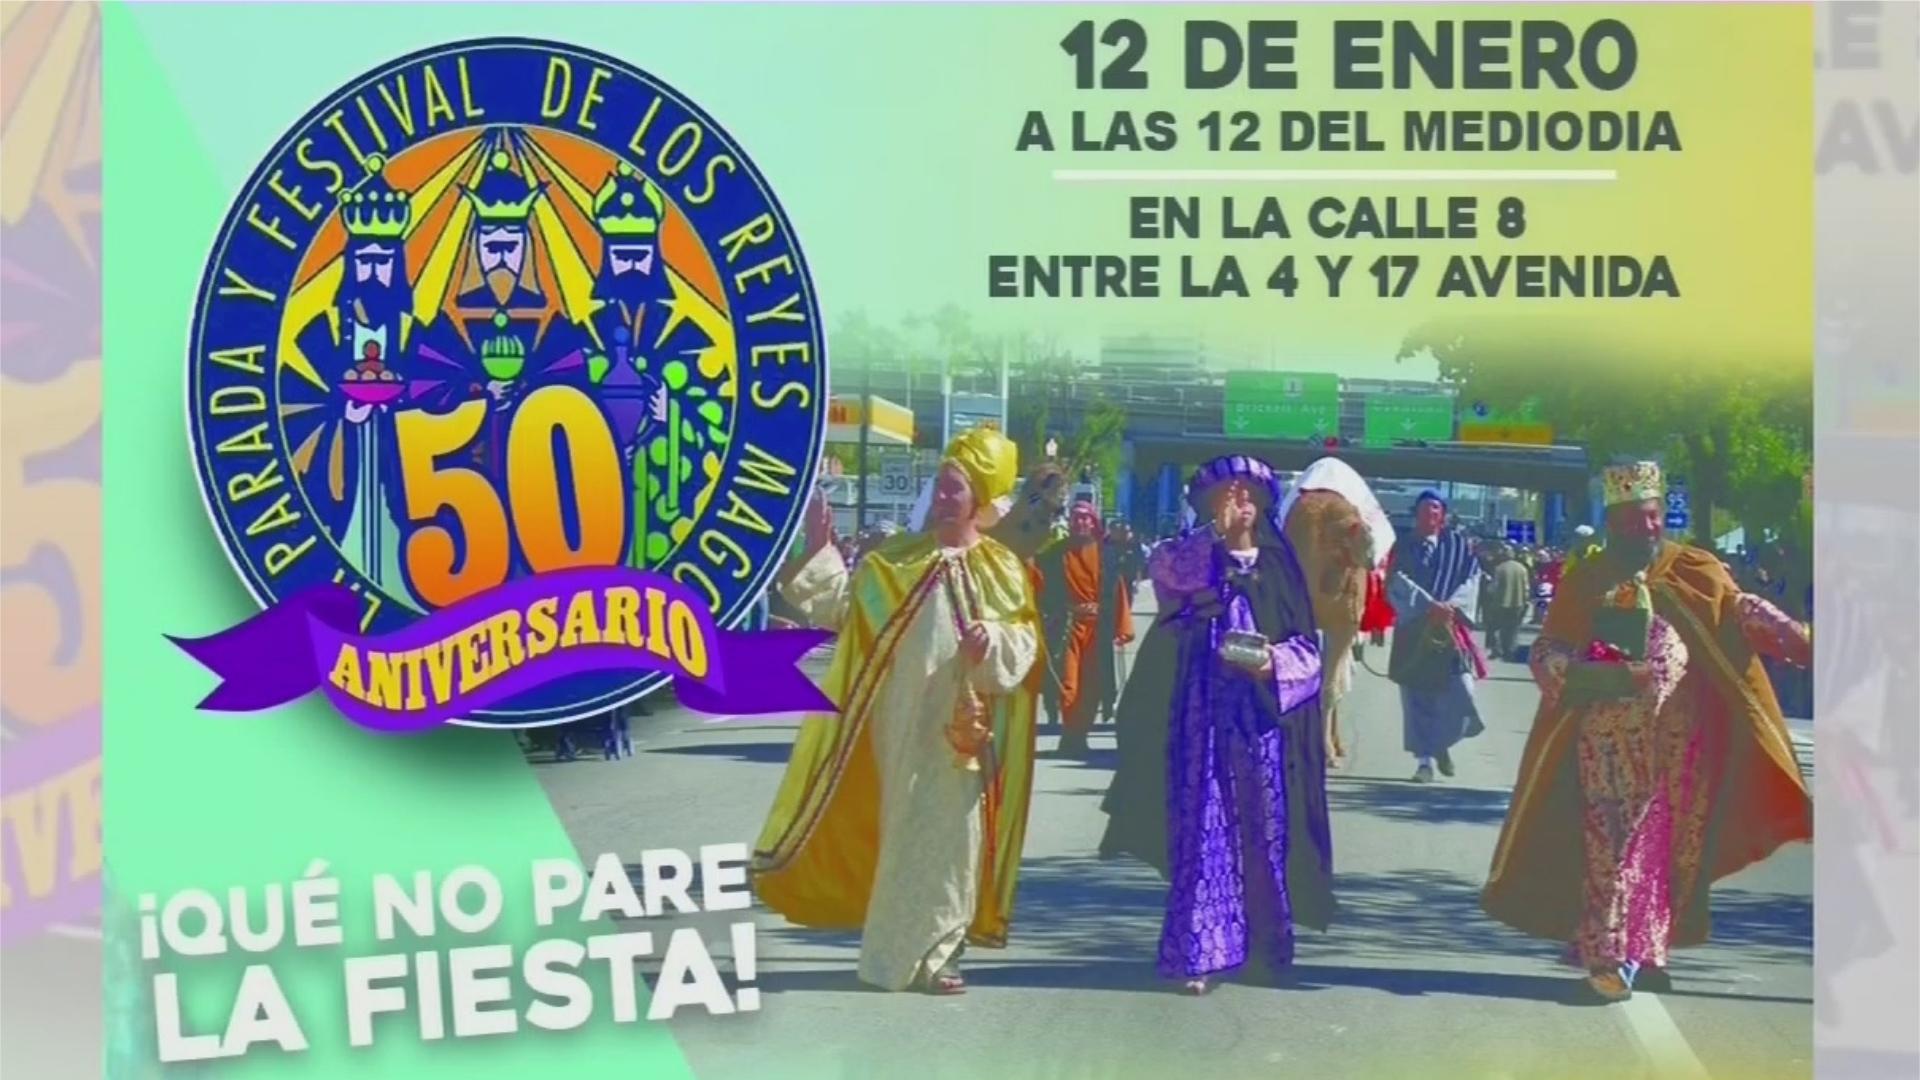 fiestas de la calle miami 2020